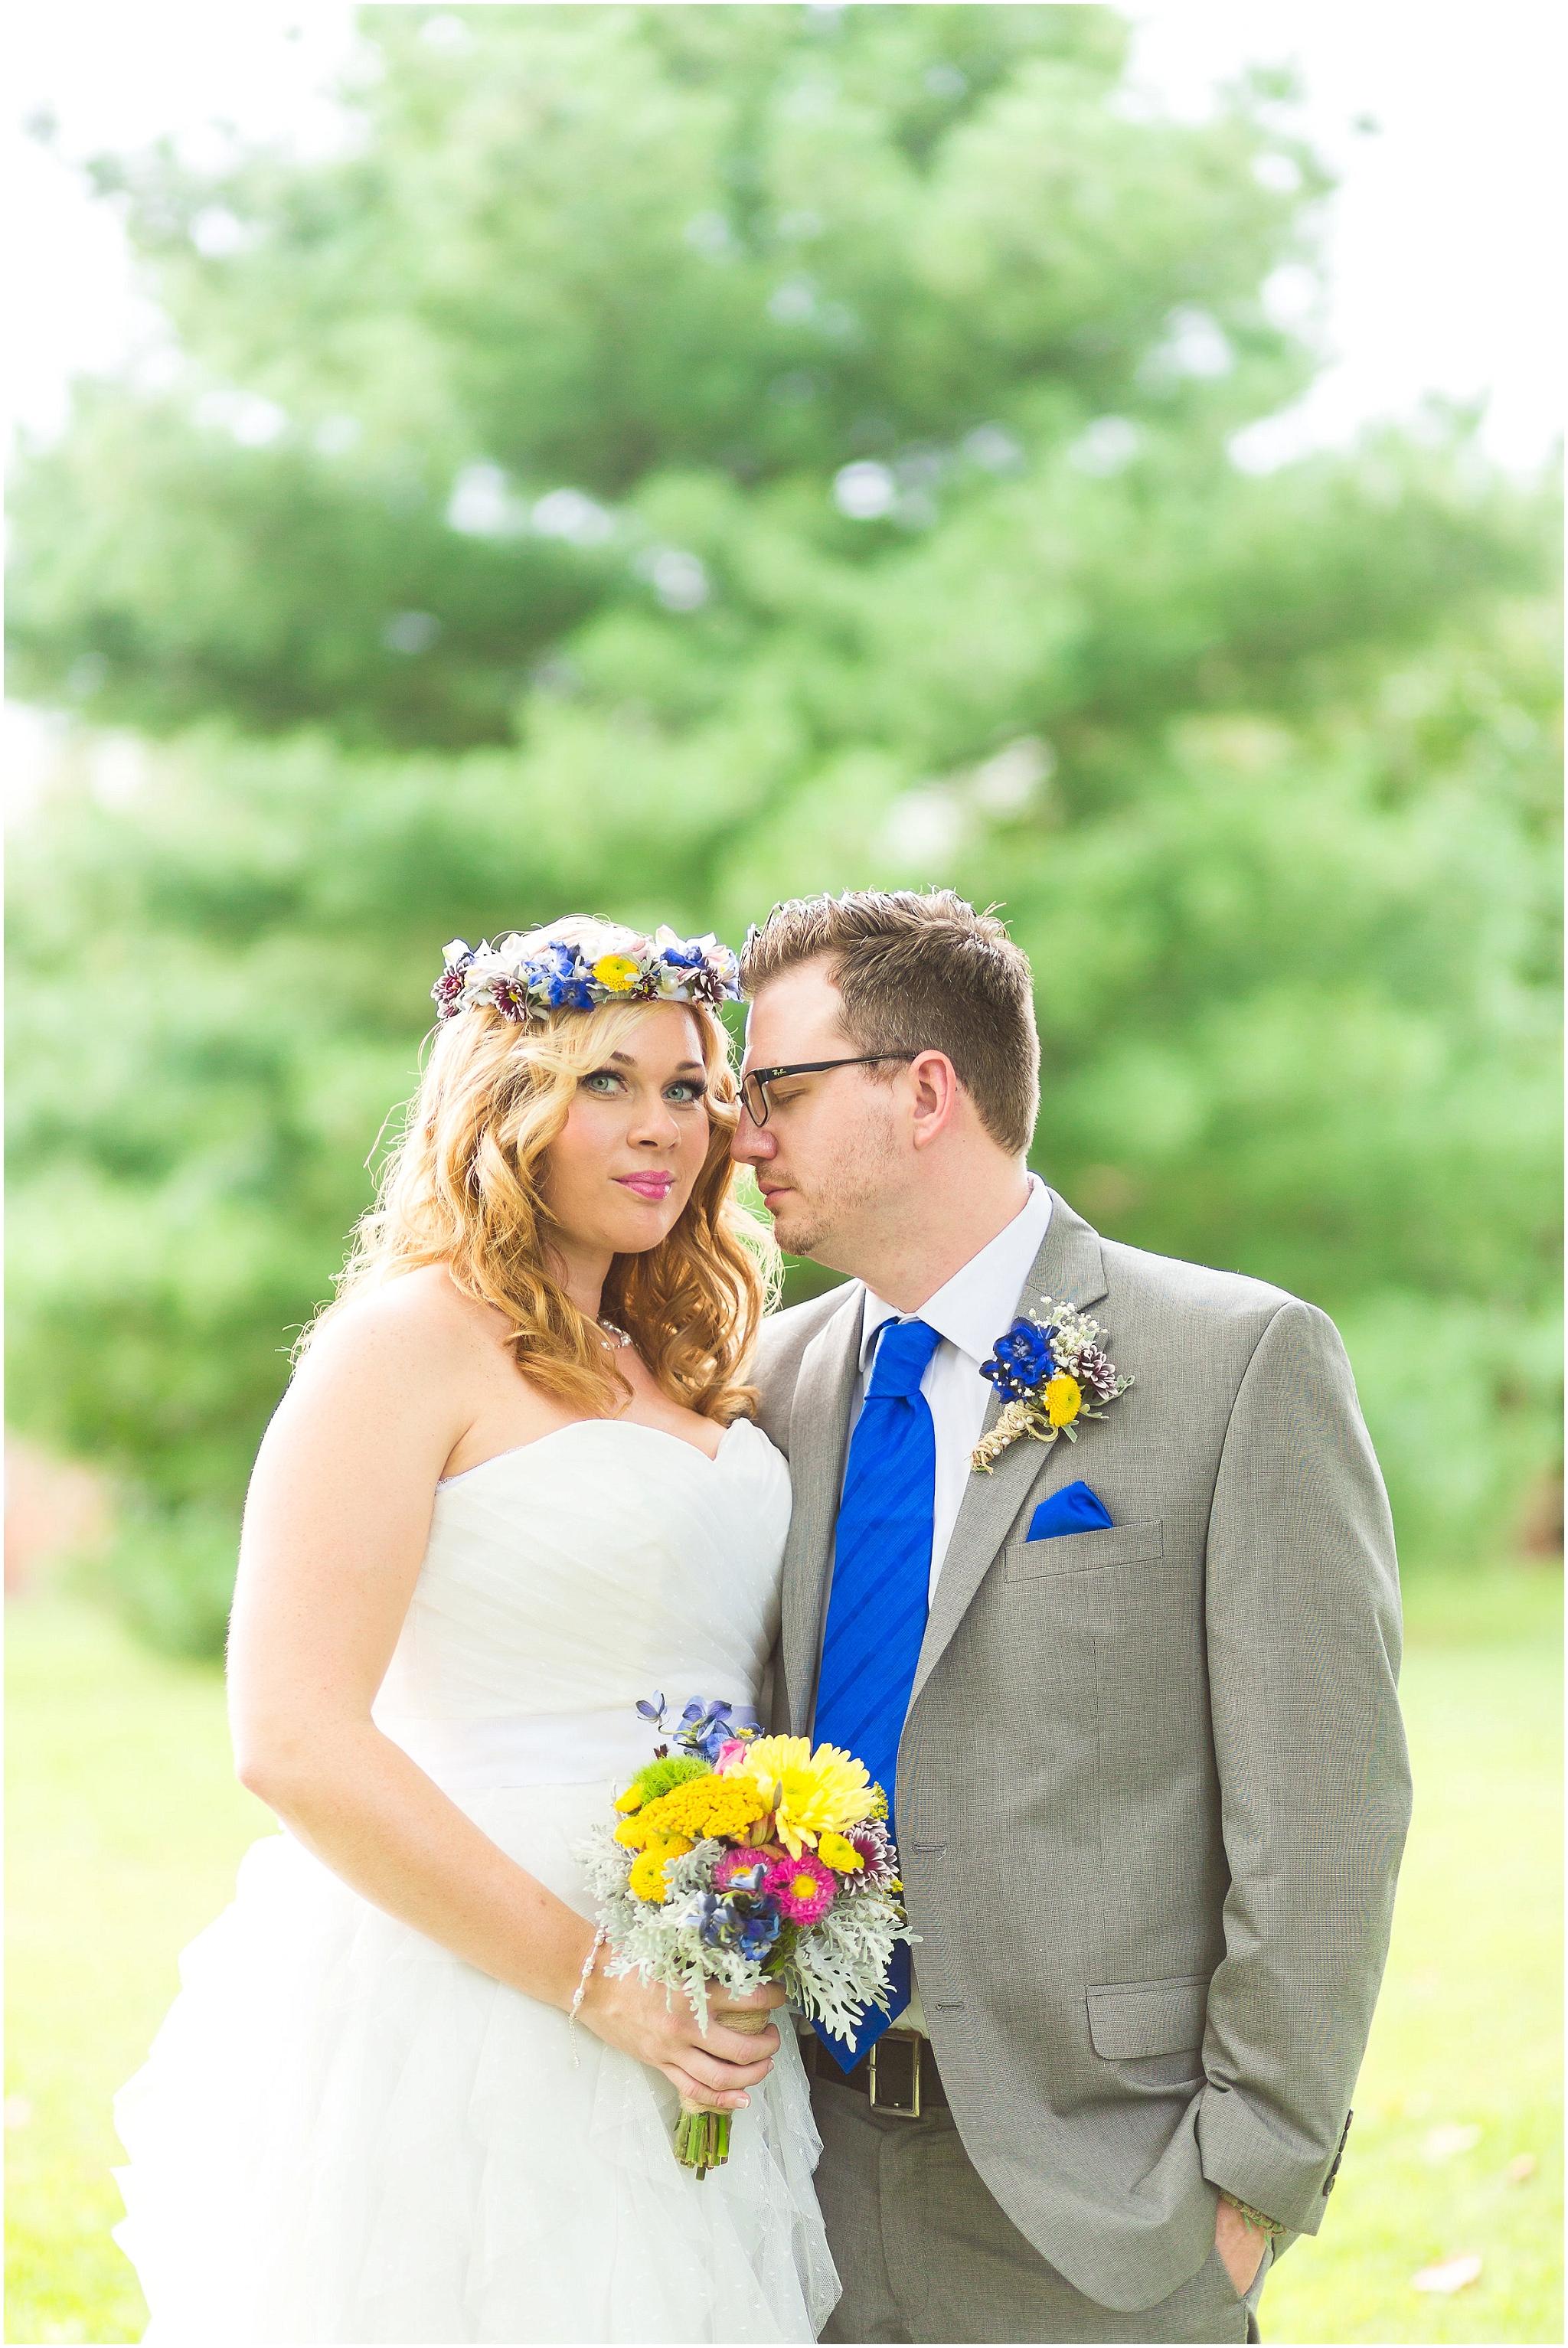 Tiffany Heidenthal - Outdoor Wedding Photography_0078.jpg